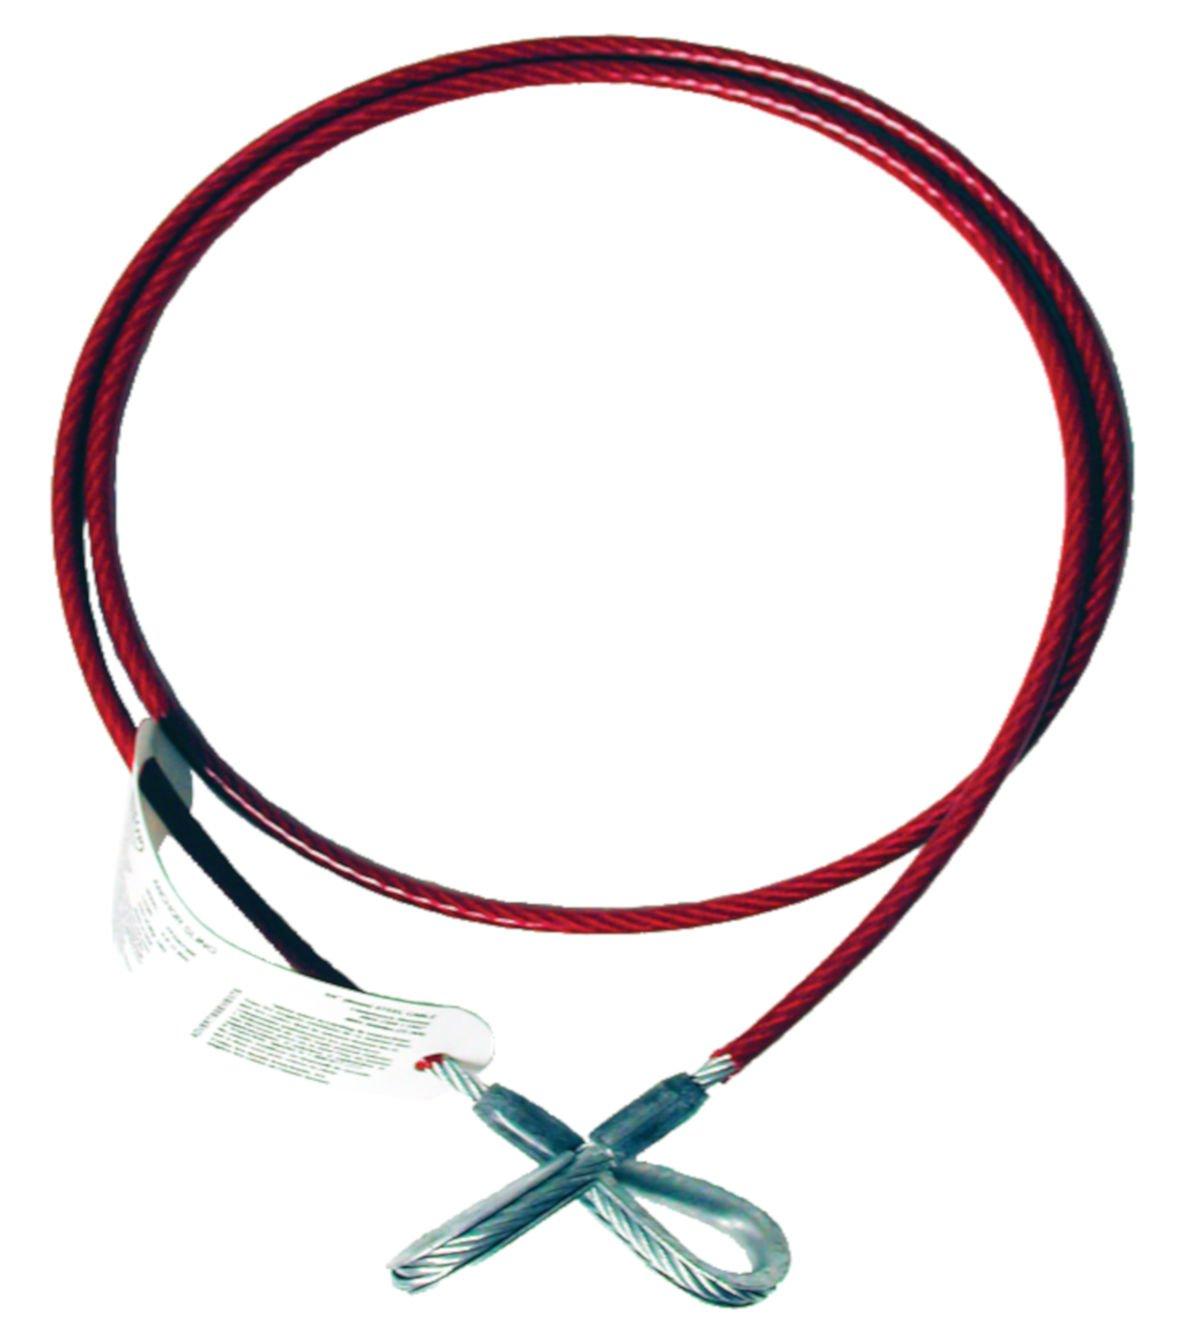 1//4 Diameter x 8 Length 1//4 Diameter x 8/' Length MSA SFP3267508 Vinyl Coated Anchorage Cable Sling